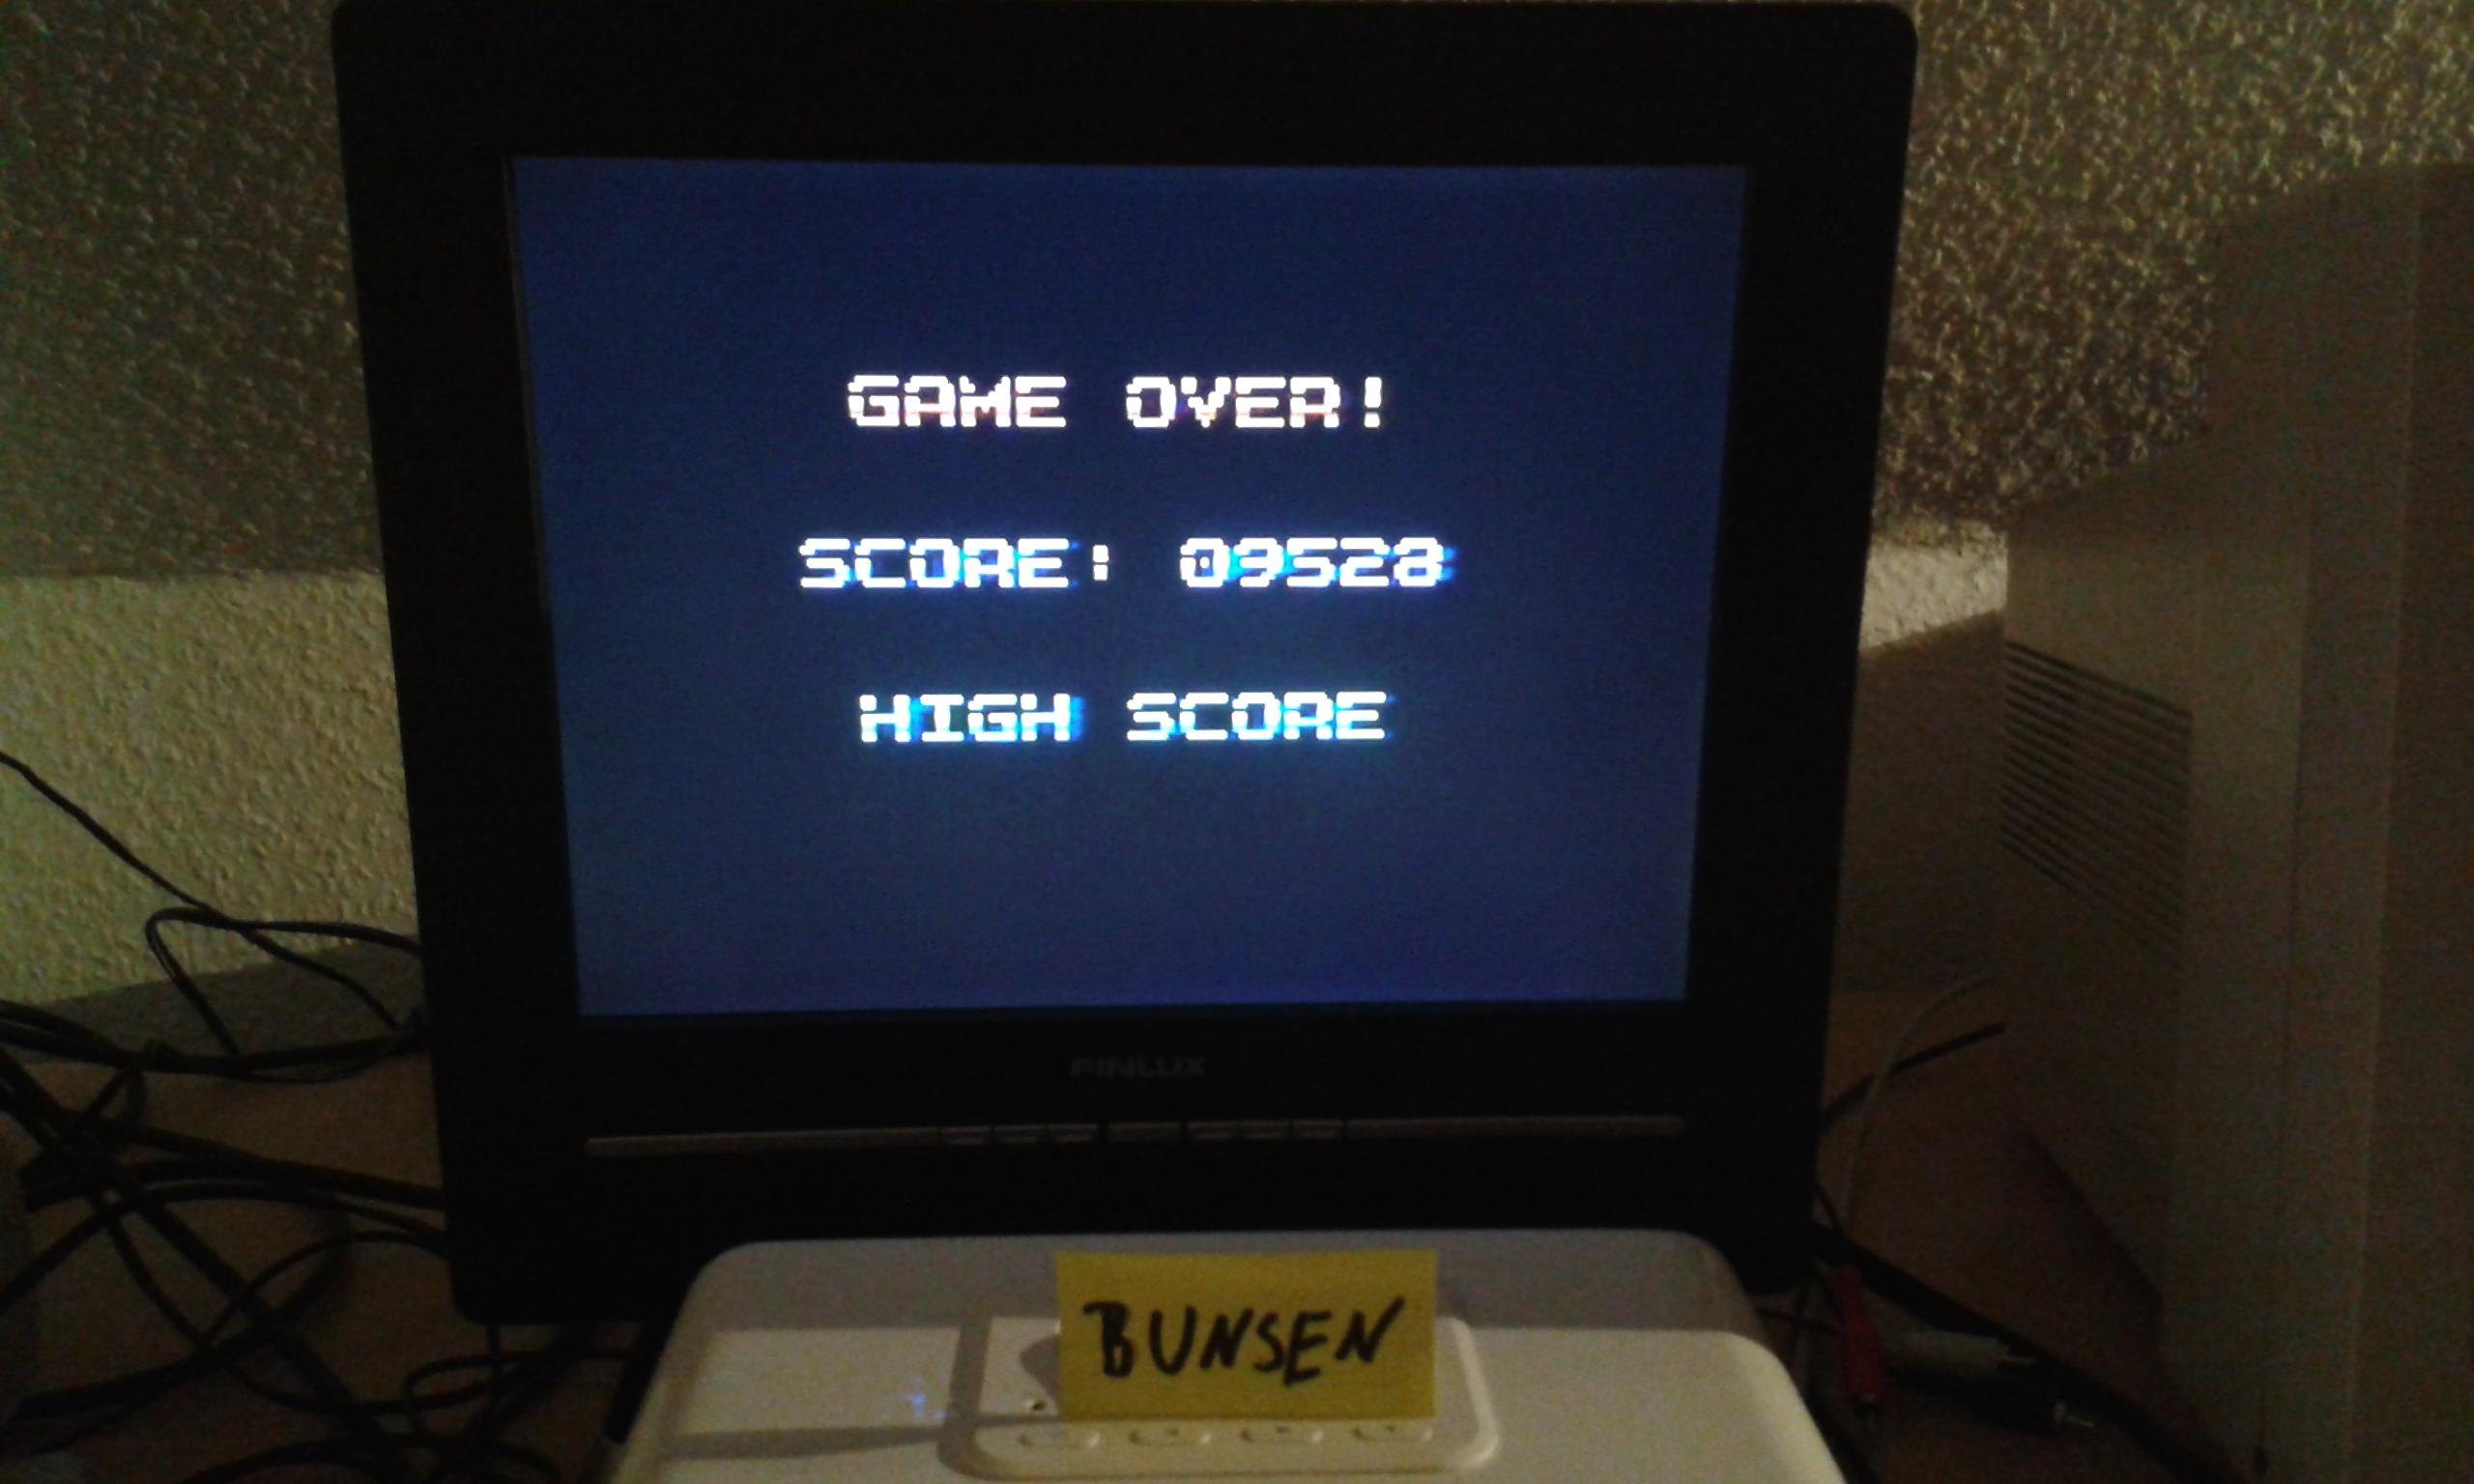 Yoomp!: Level 1 Start 9,528 points